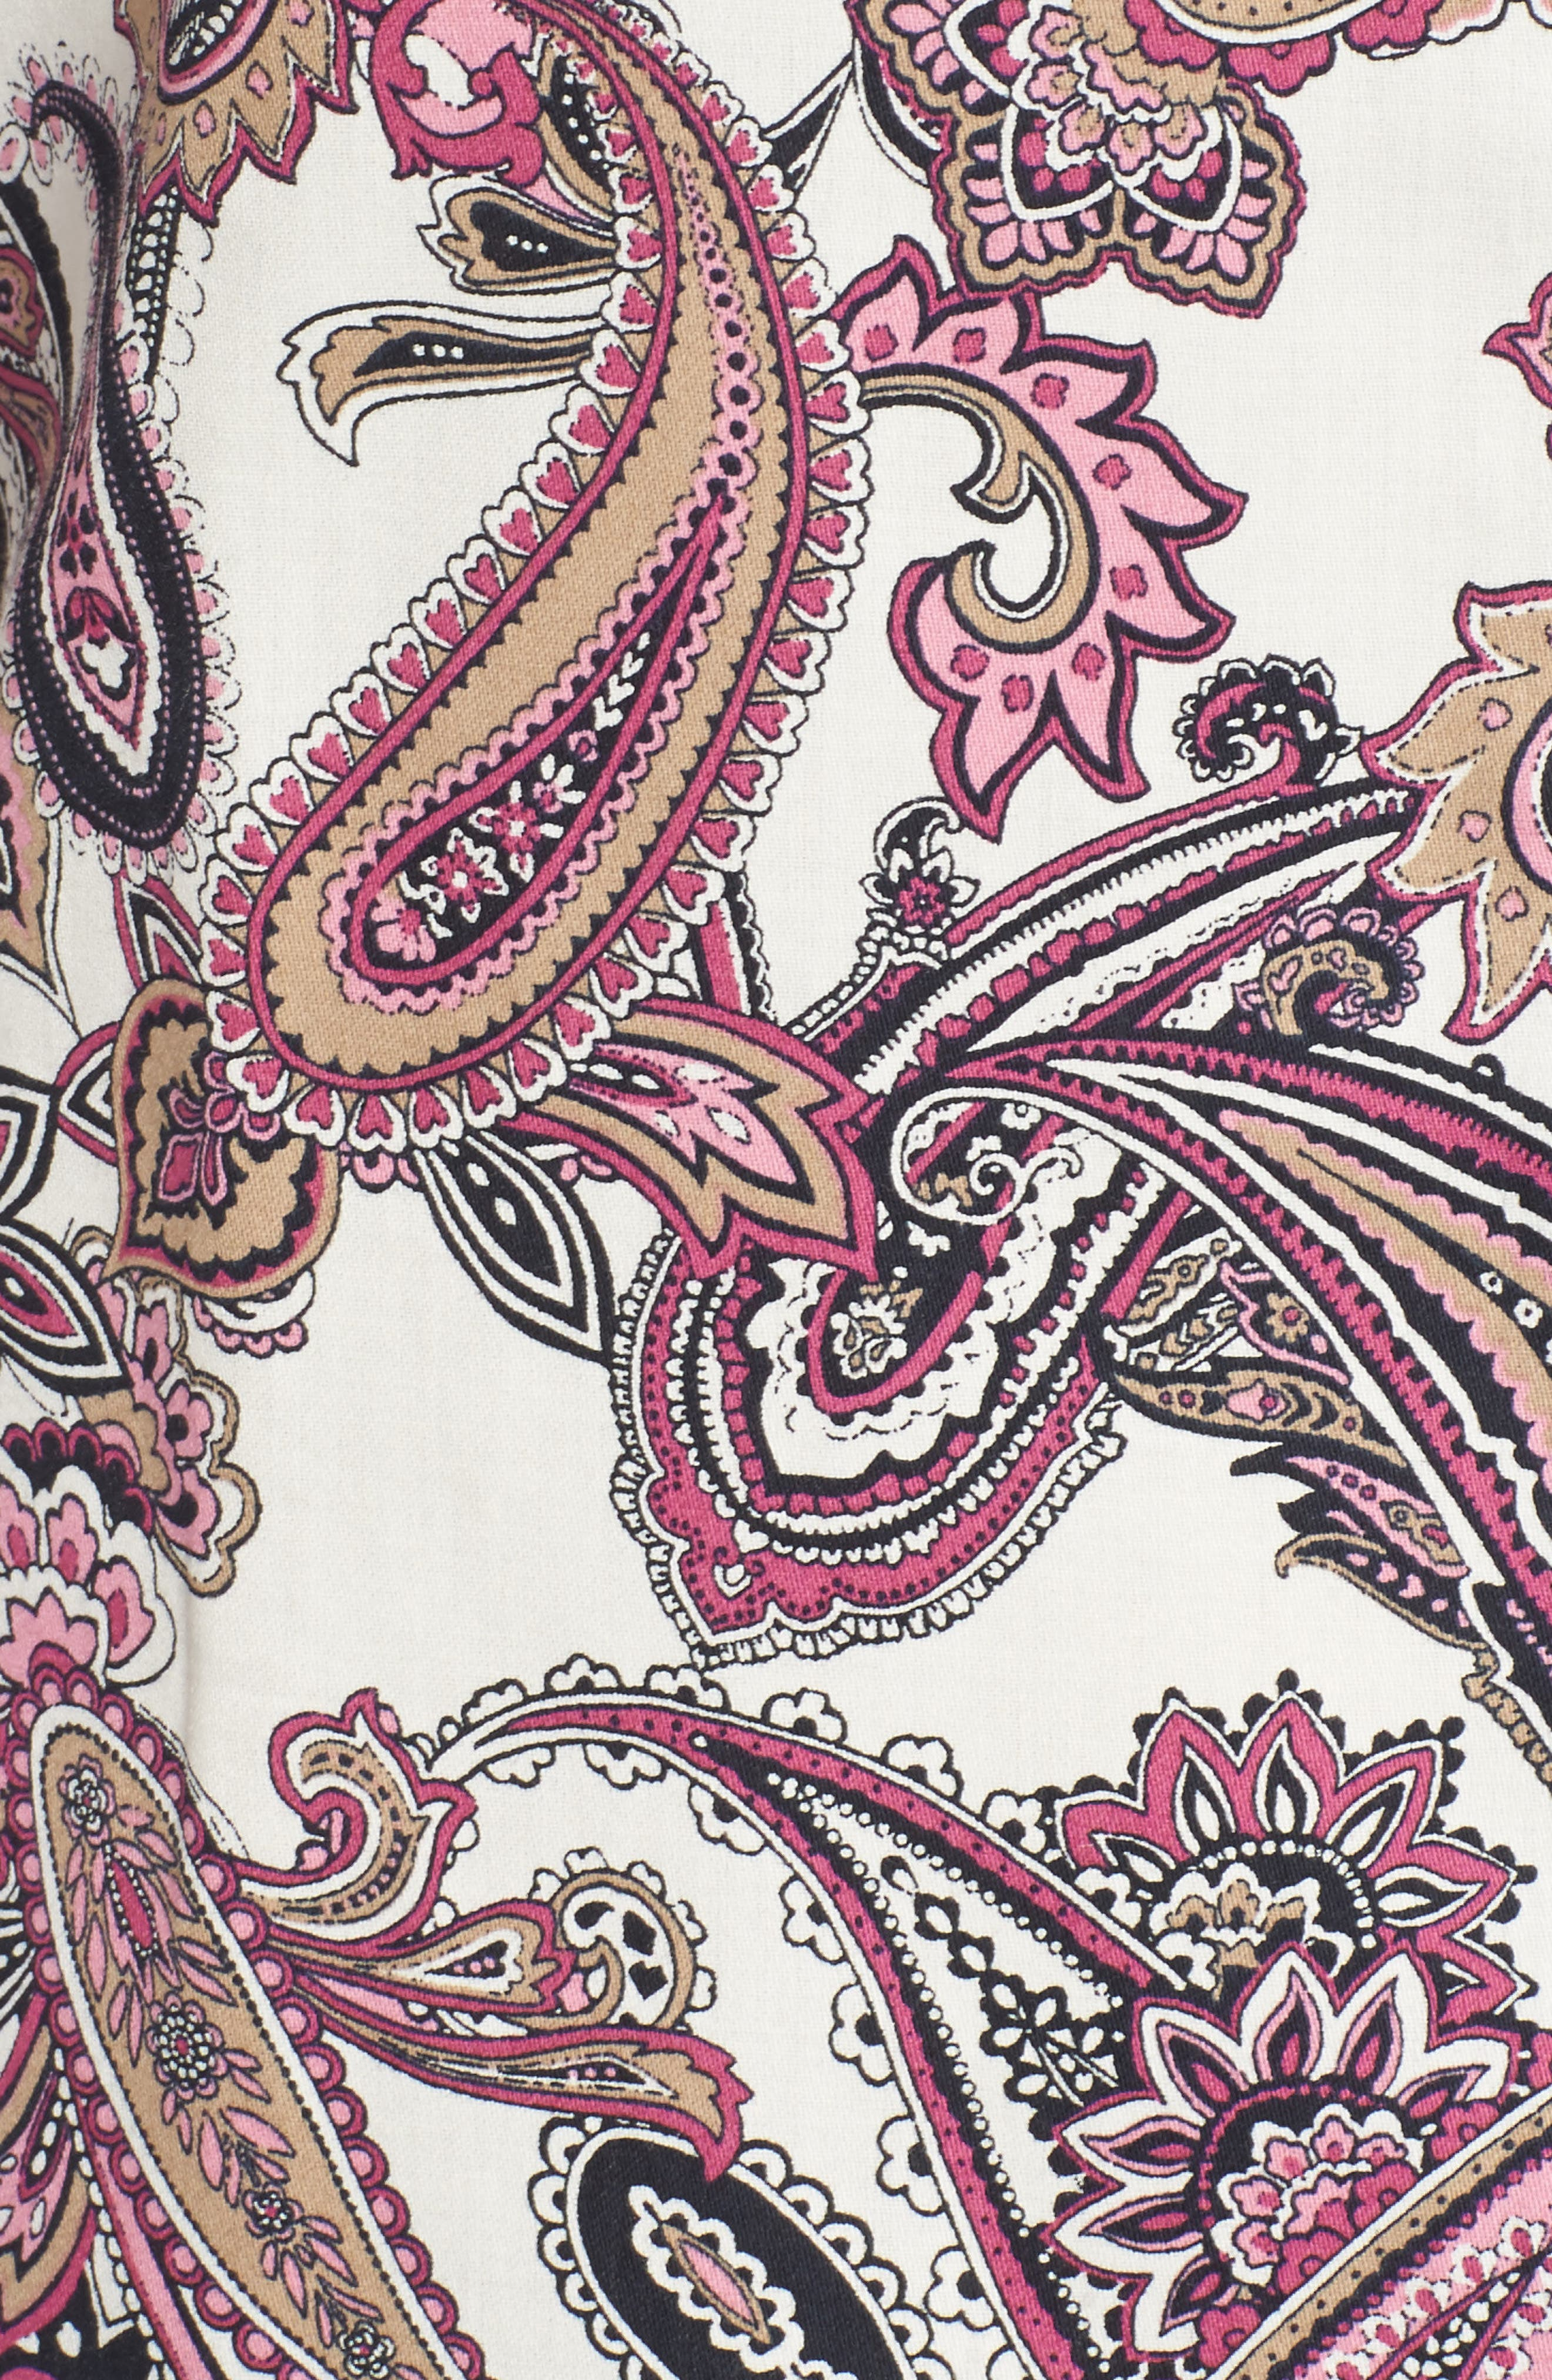 Mary Paisley Wrinkle Free Shirt,                             Alternate thumbnail 5, color,                             935